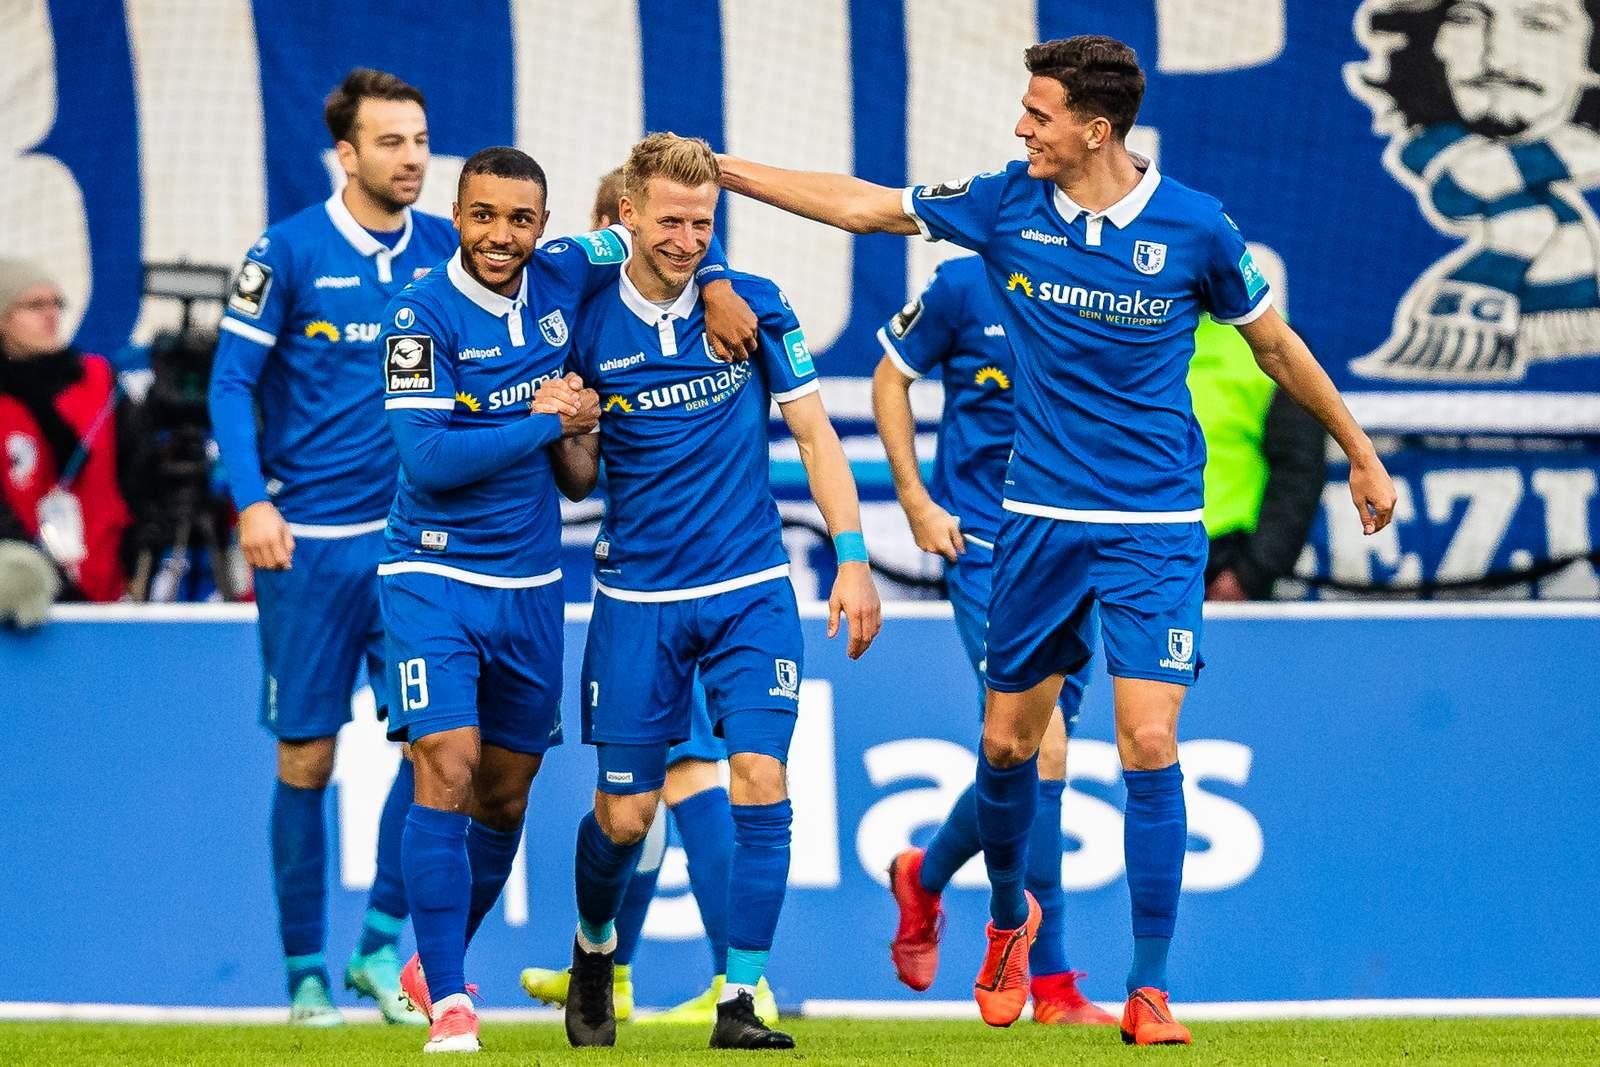 Jubel beim 1. FC Magdeburg